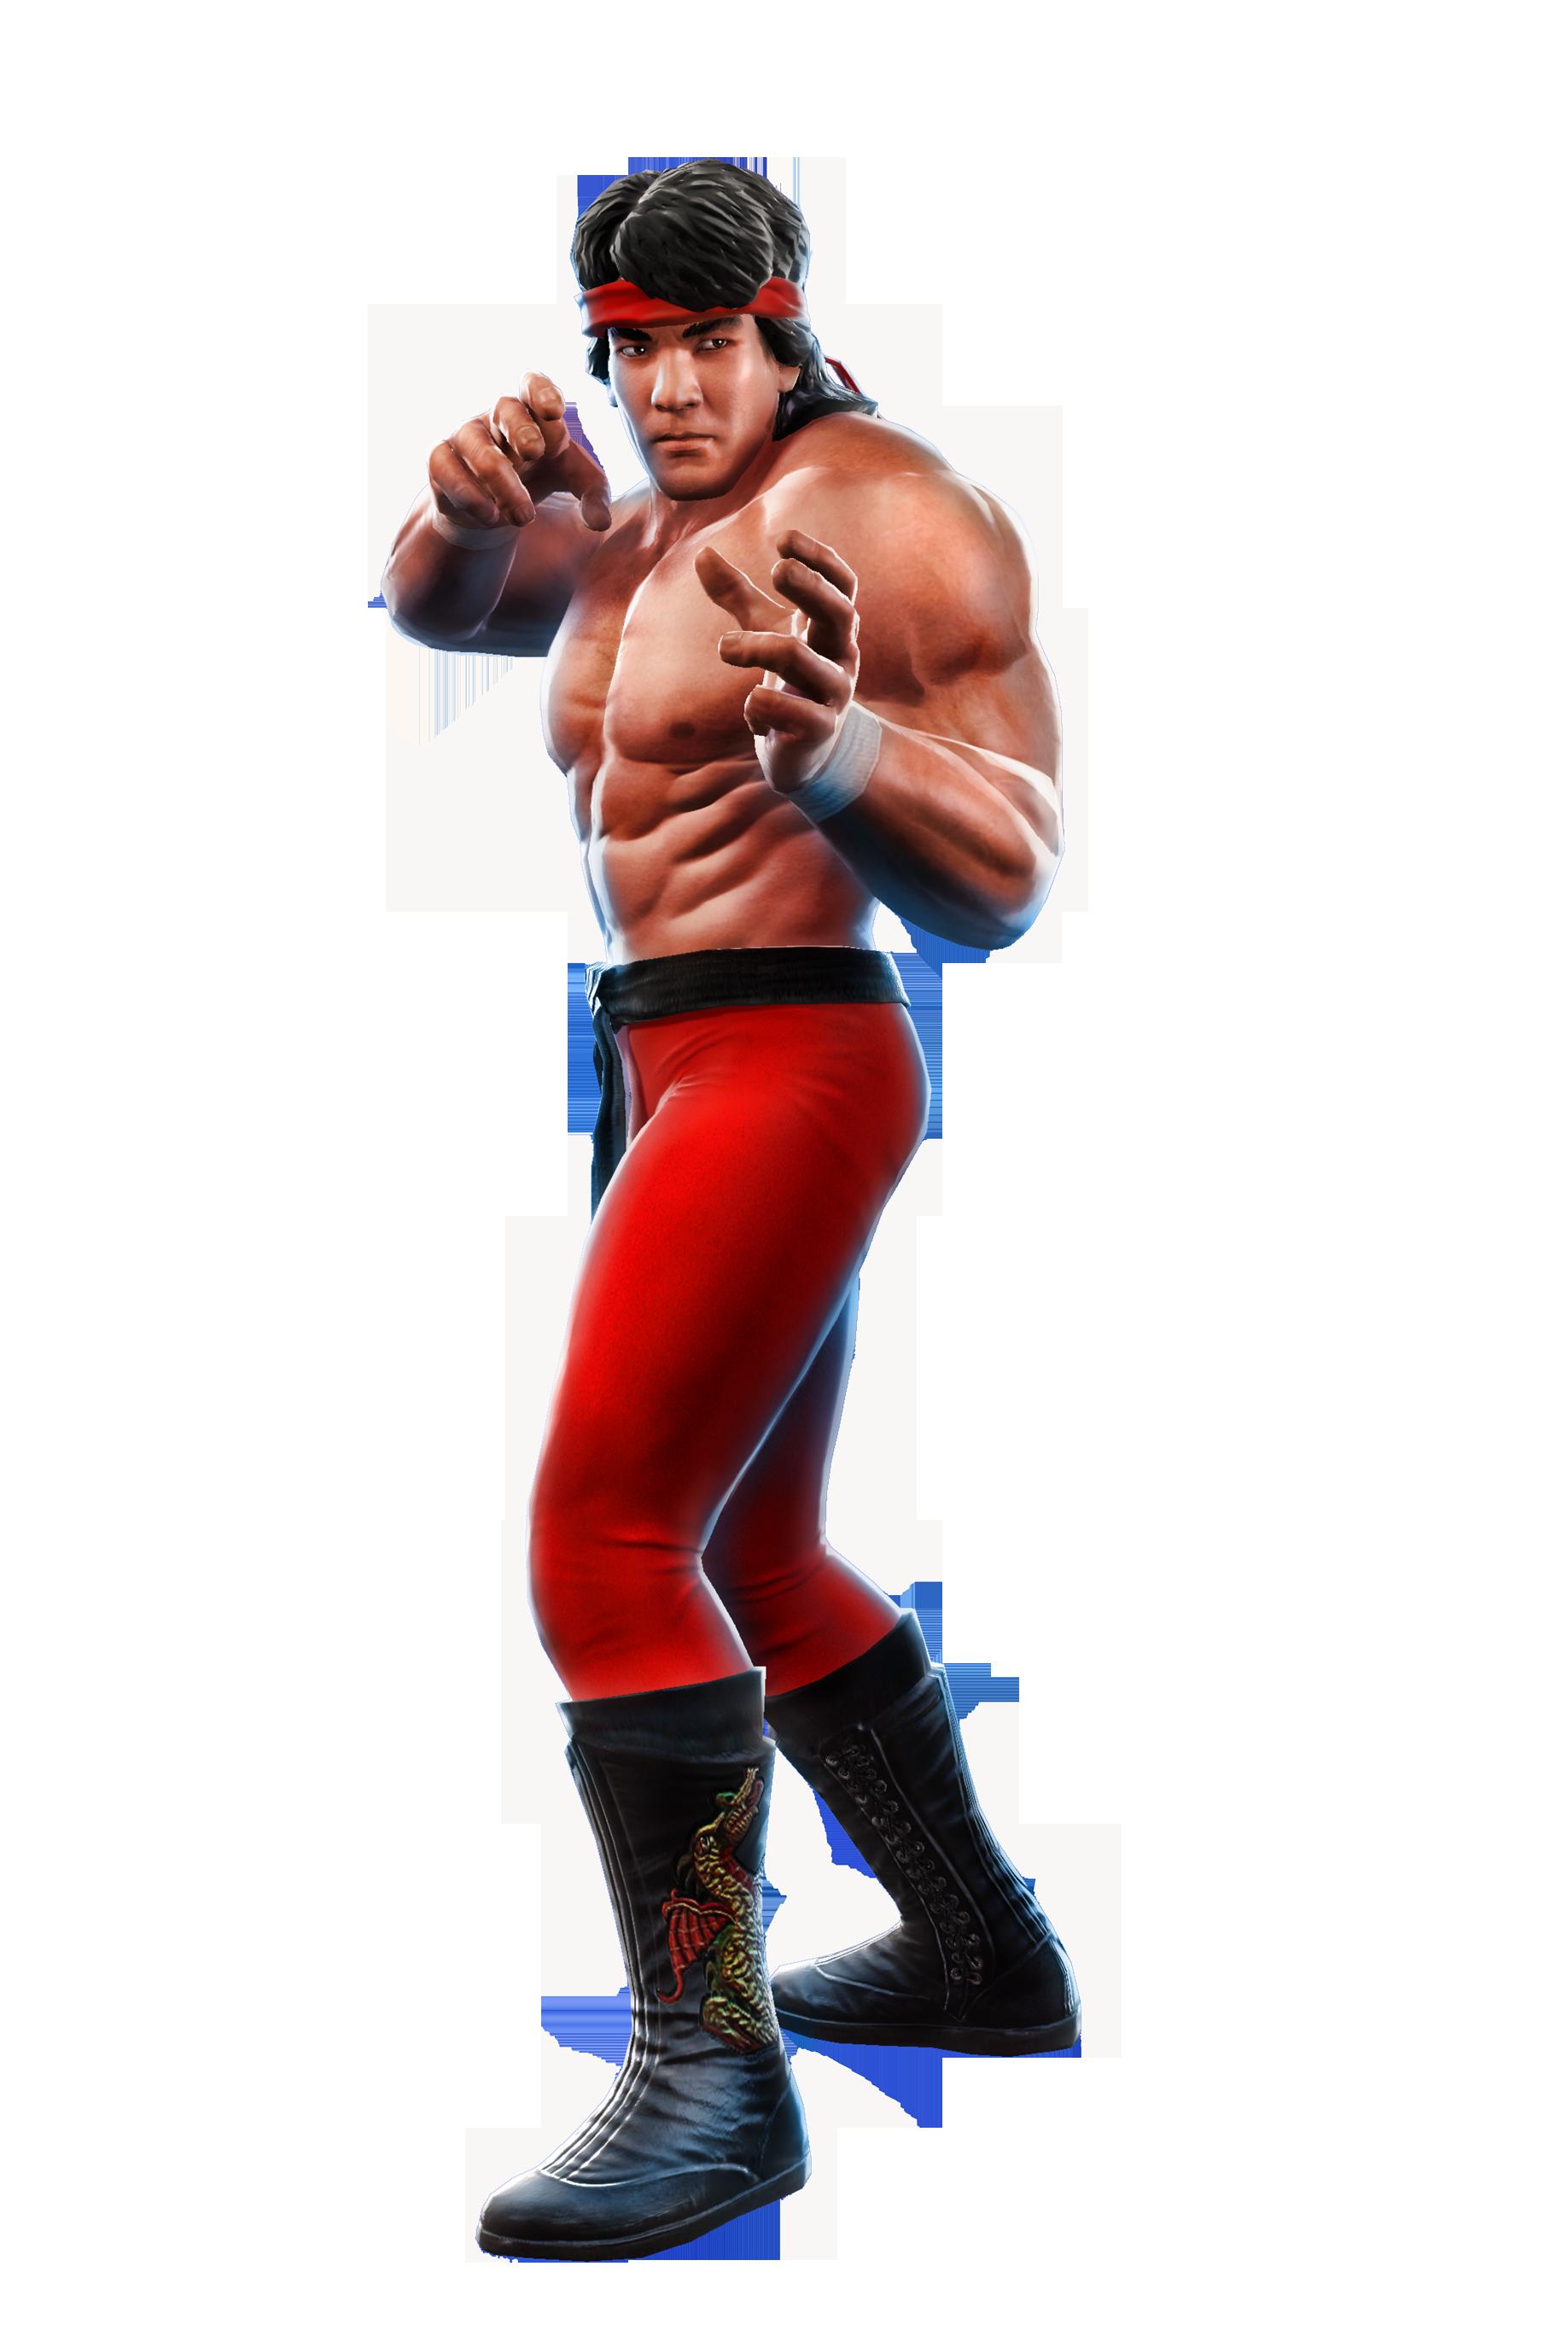 Ricky Steamboat - WWE All Stars Wiki